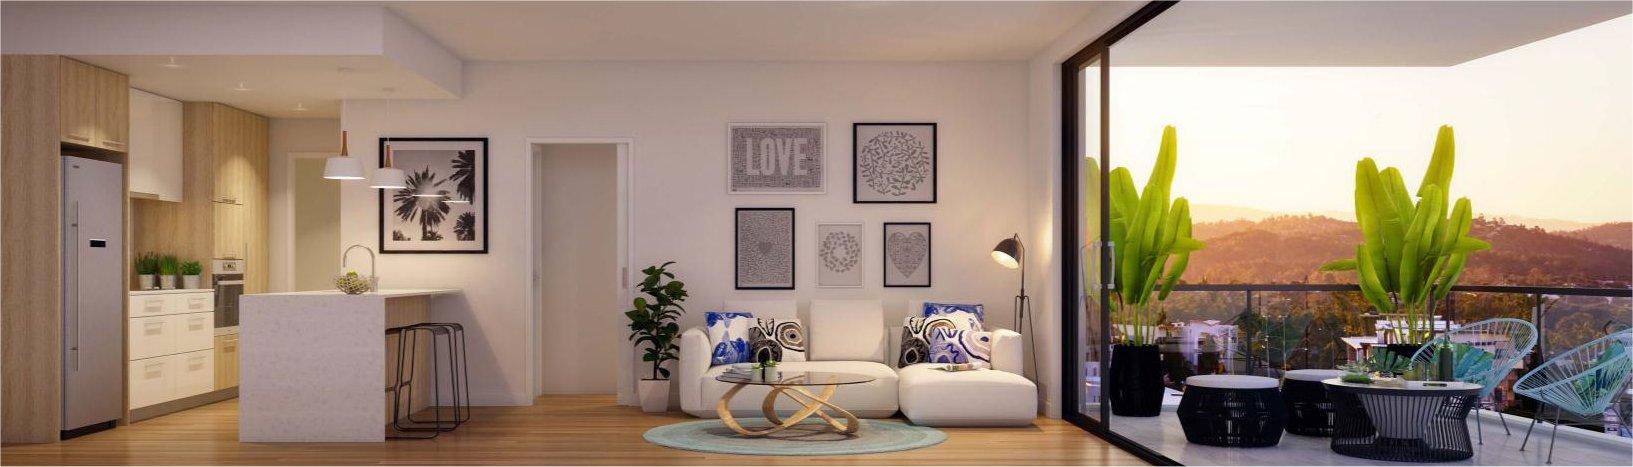 Loungeroom view